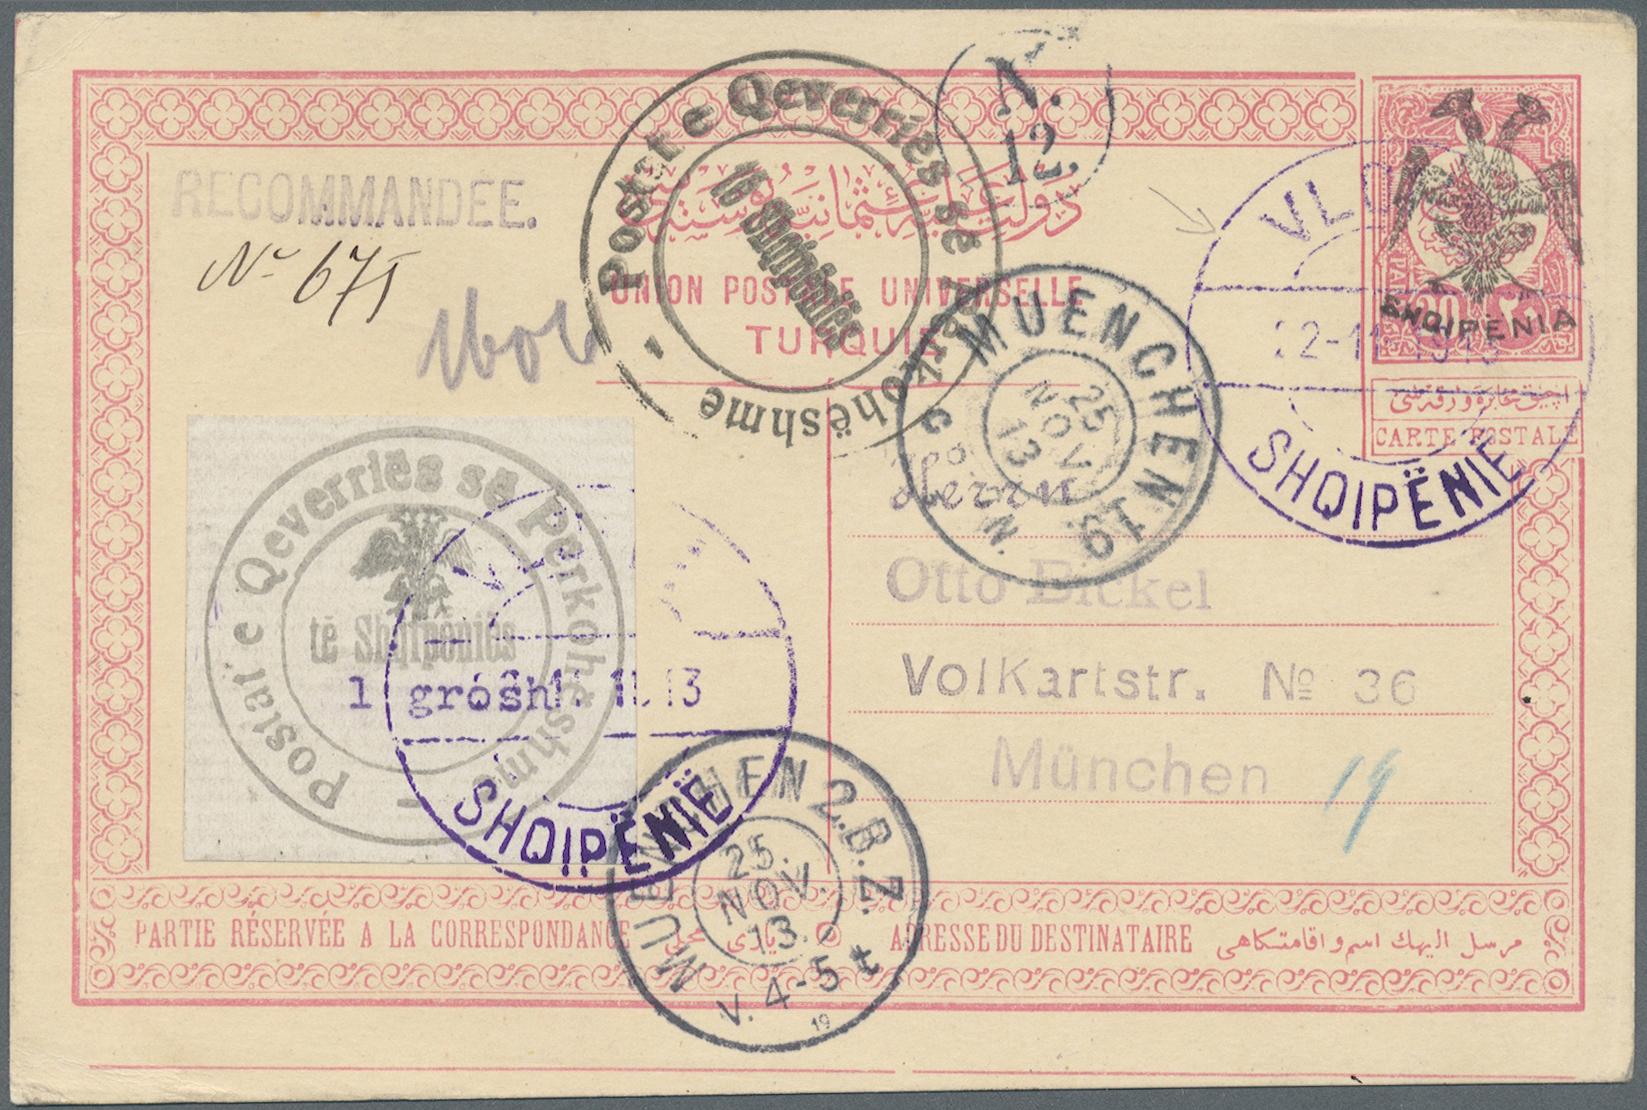 Lot 15557 - Albanien - Ganzsachen  -  Auktionshaus Christoph Gärtner GmbH & Co. KG Single lots Philately Overseas & Europe. Auction #39 Day 4